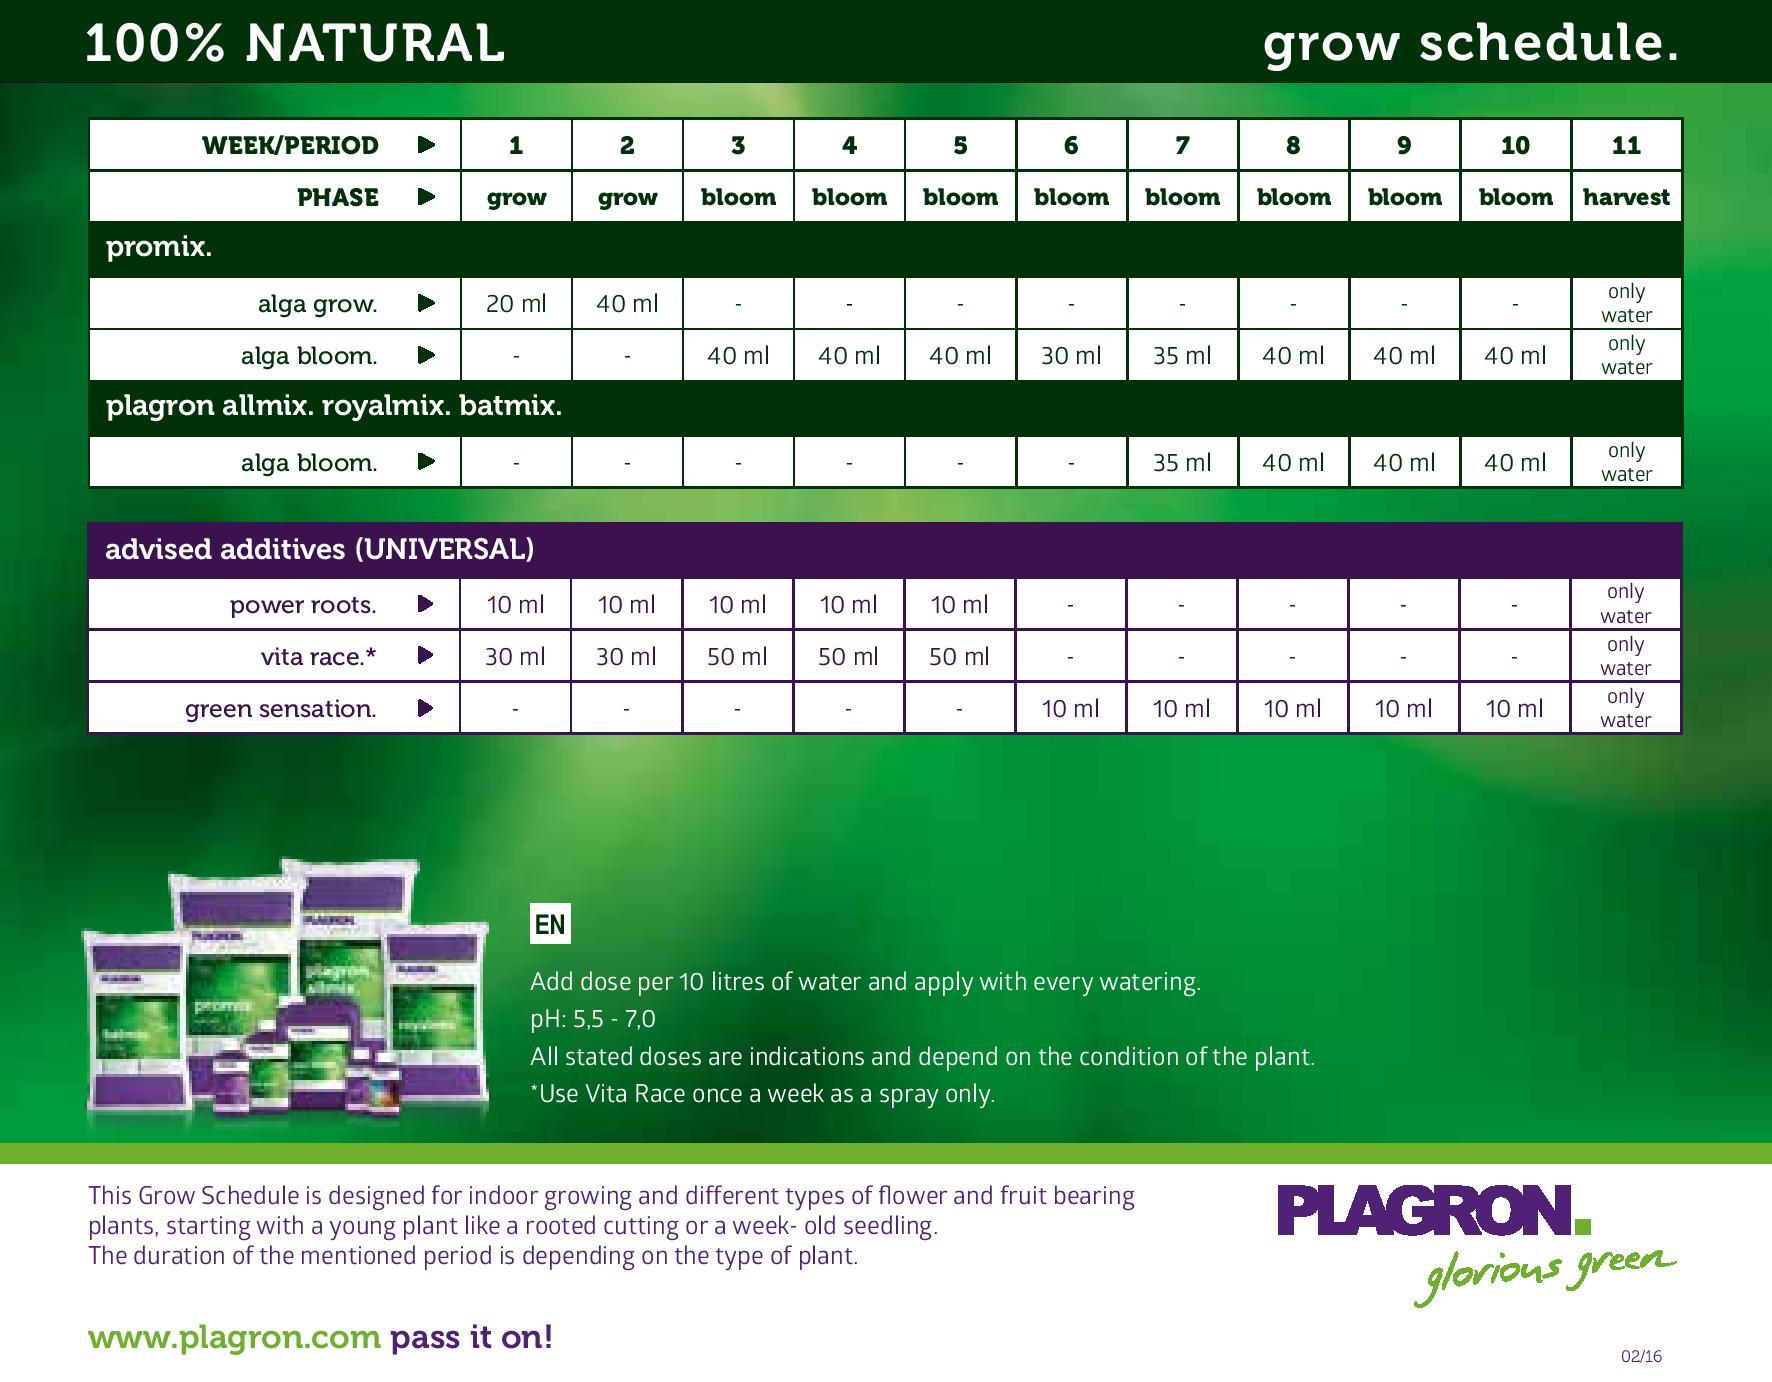 Plagron feeding chart